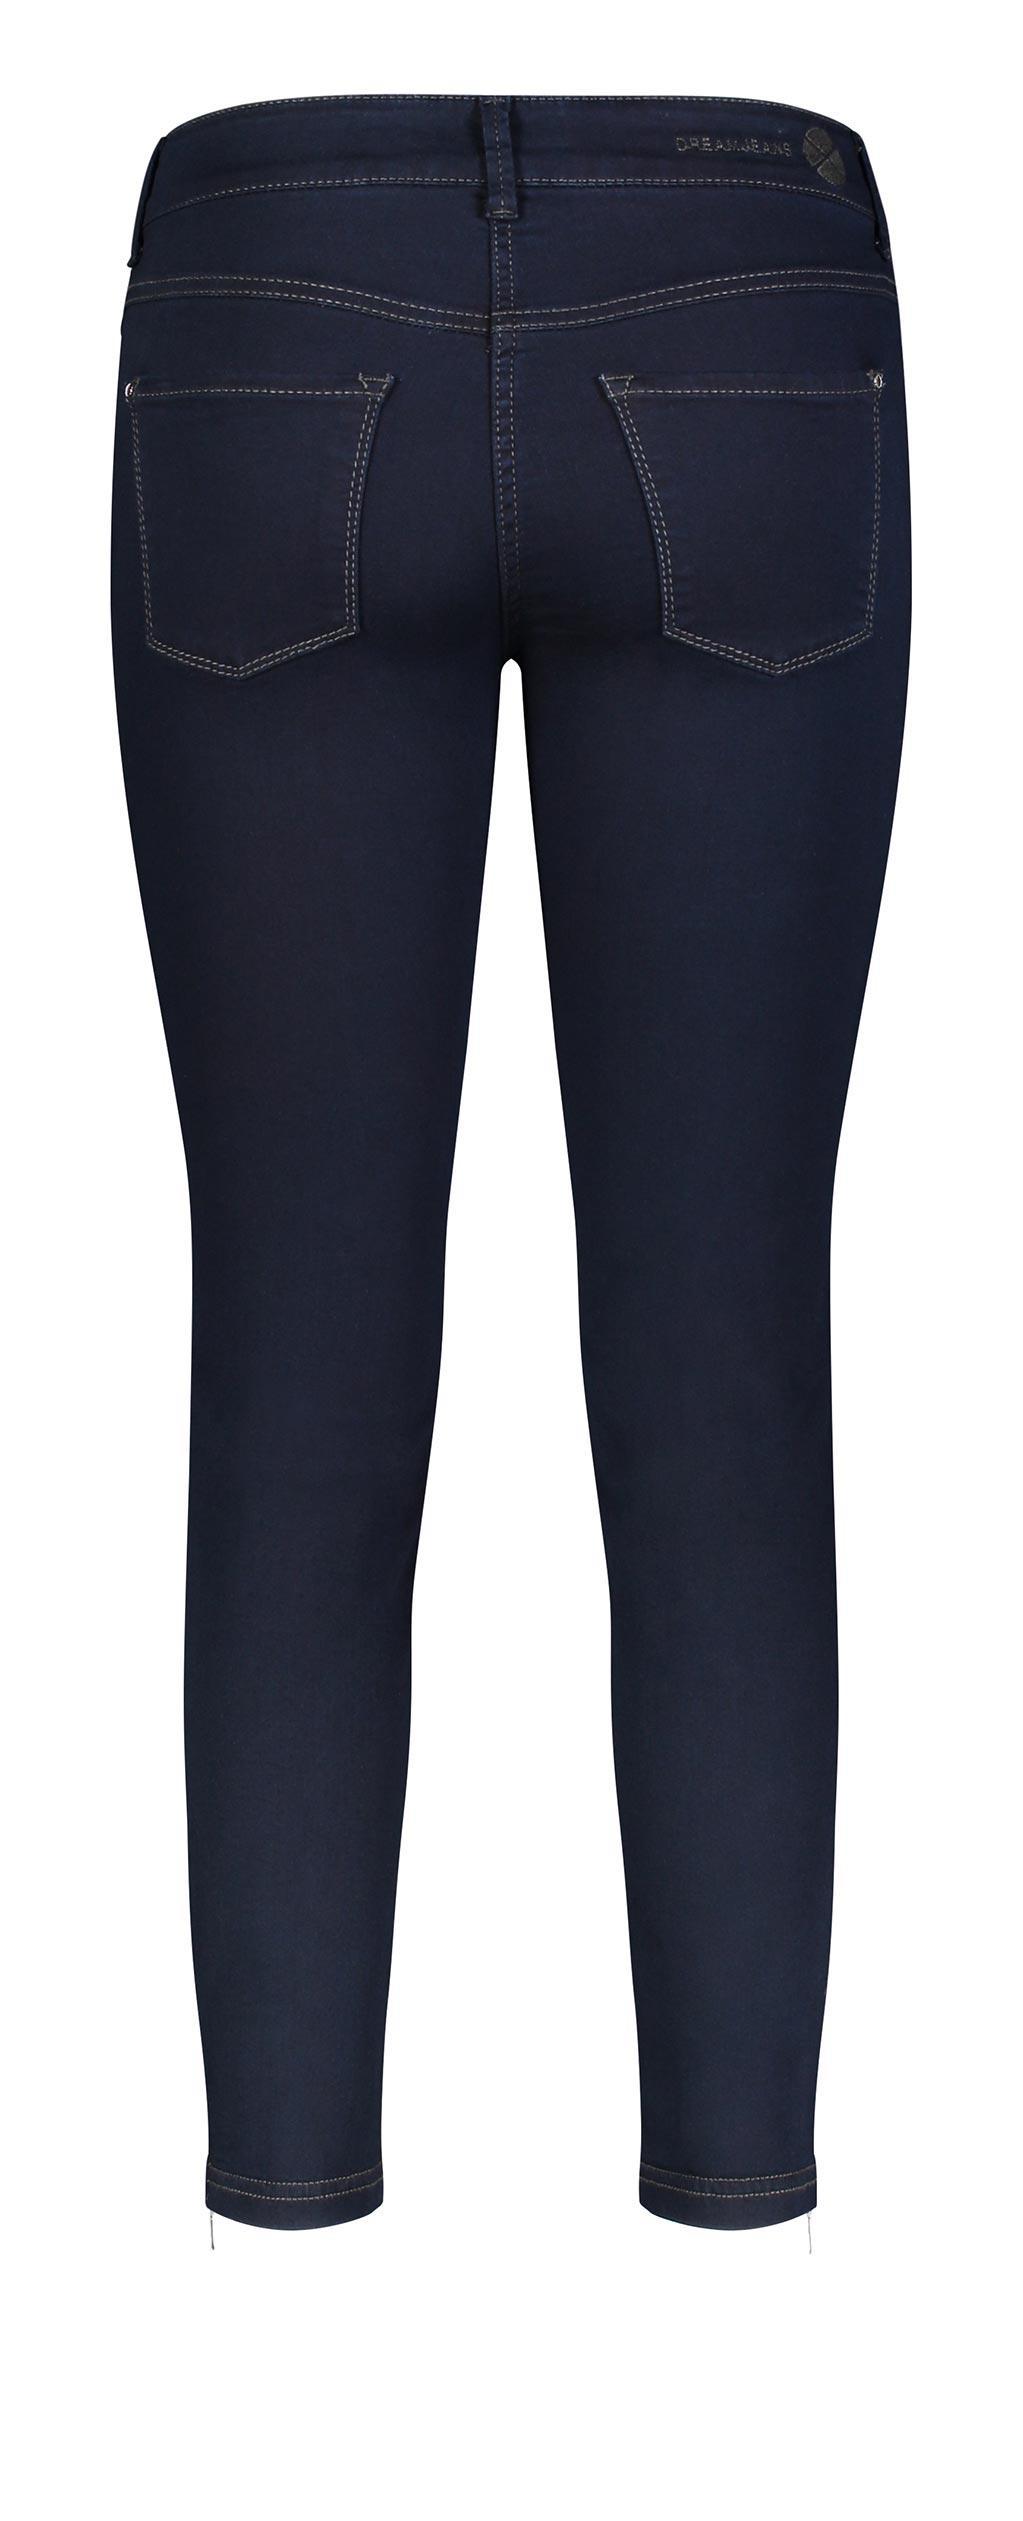 MAC Jeans Dream Chic dark rinsewash